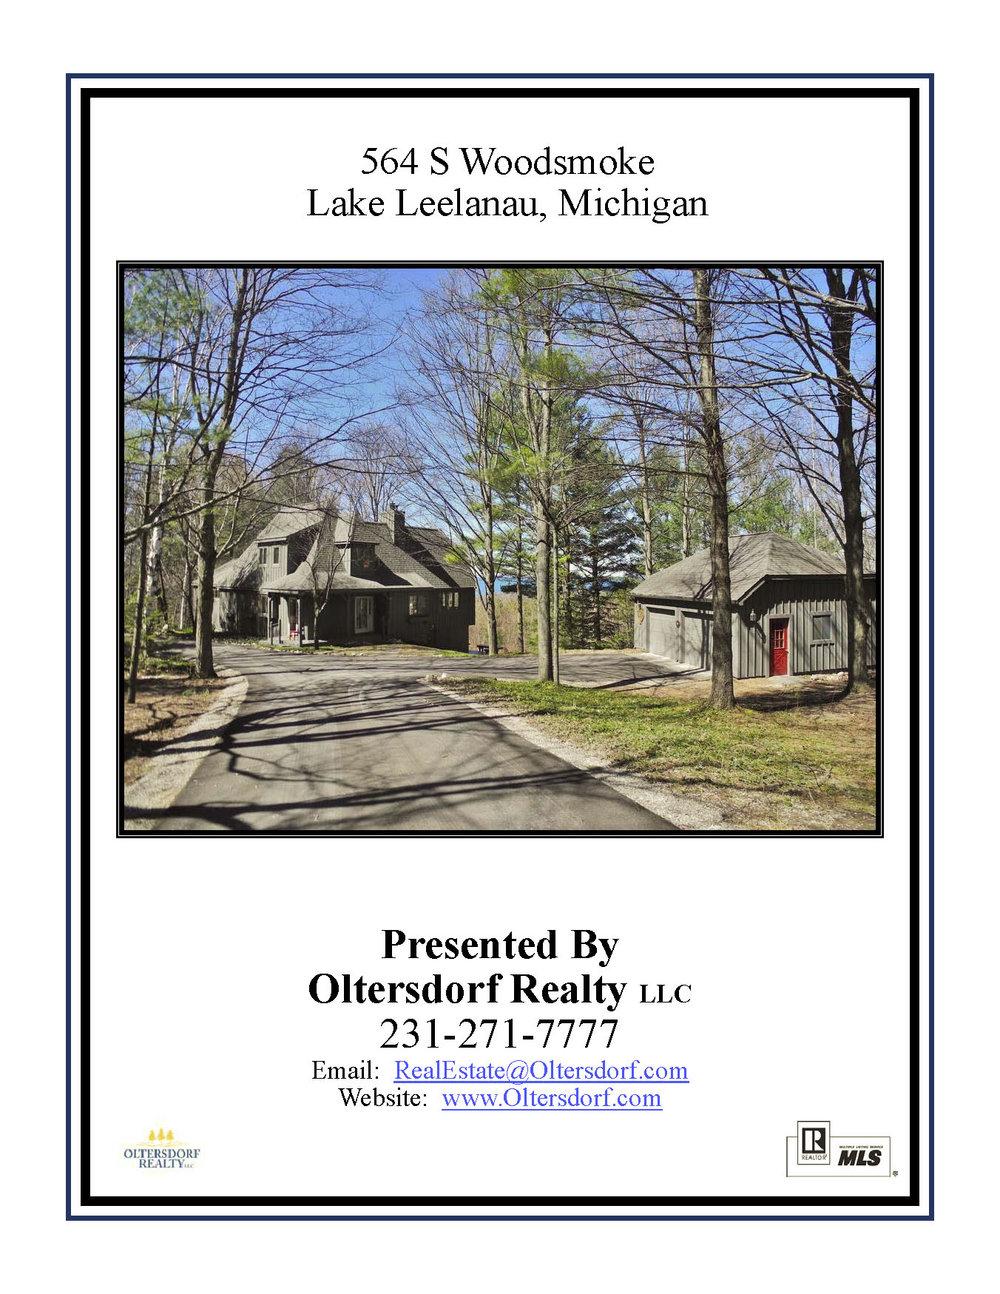 564 S Woodsmoke Drive, Lake Leelanau, MI – Sunset Lake Michigan Water Views - For Sale by Oltersdorf Realty - Marketing Packet (1).jpg